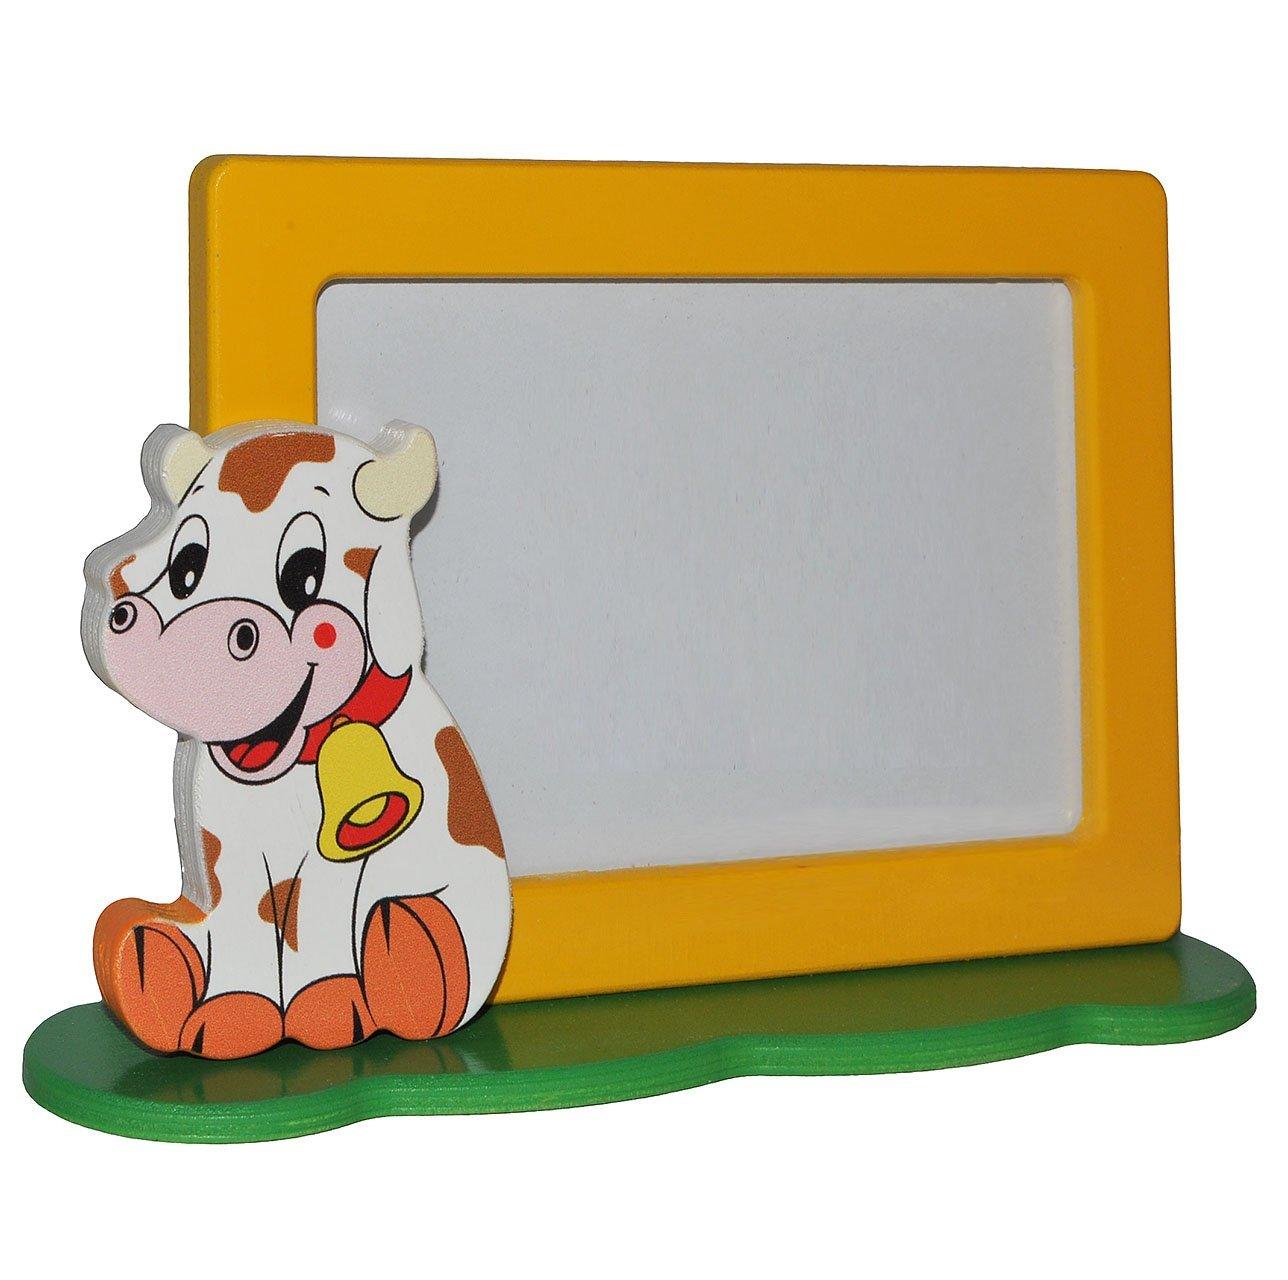 3-D Fotorahmen / Bilderrahmen aus Holz incl. Namen - Kuh - mit 1 ...